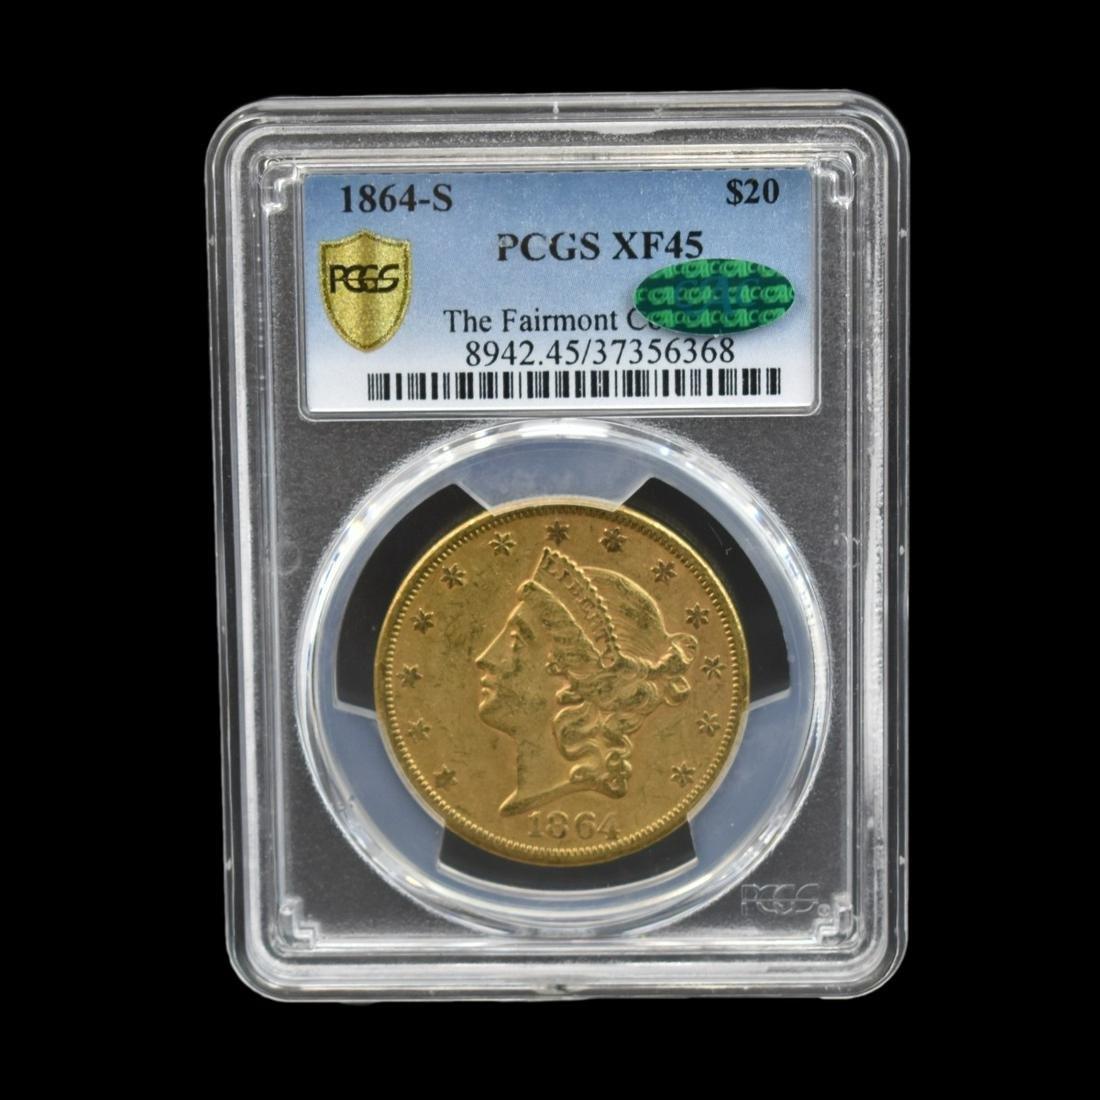 1864-S US Liberty Head Twenty Dollar